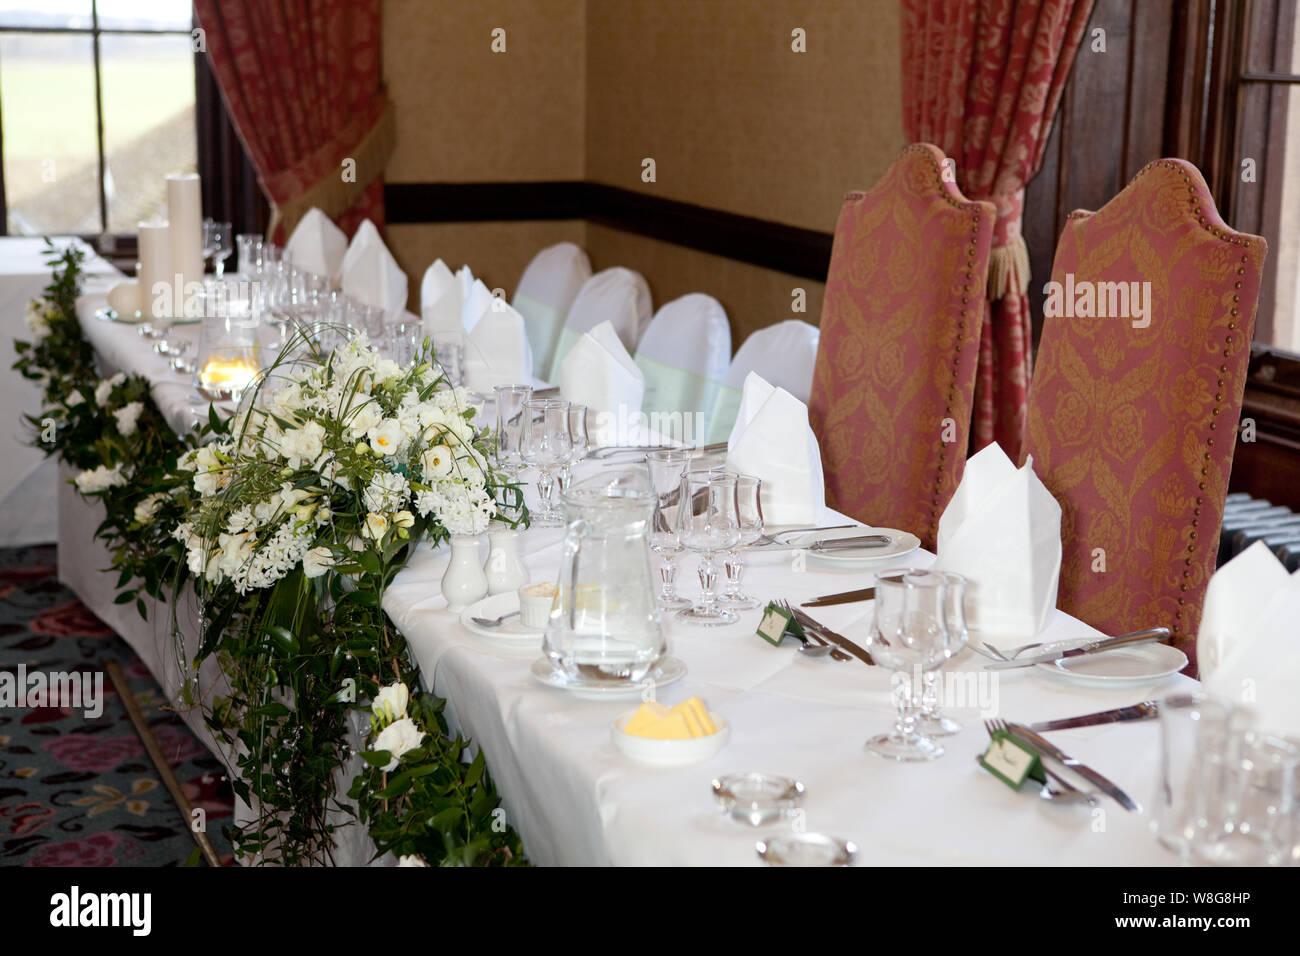 Wedding Venue Tables Stock Photos Wedding Venue Tables Stock